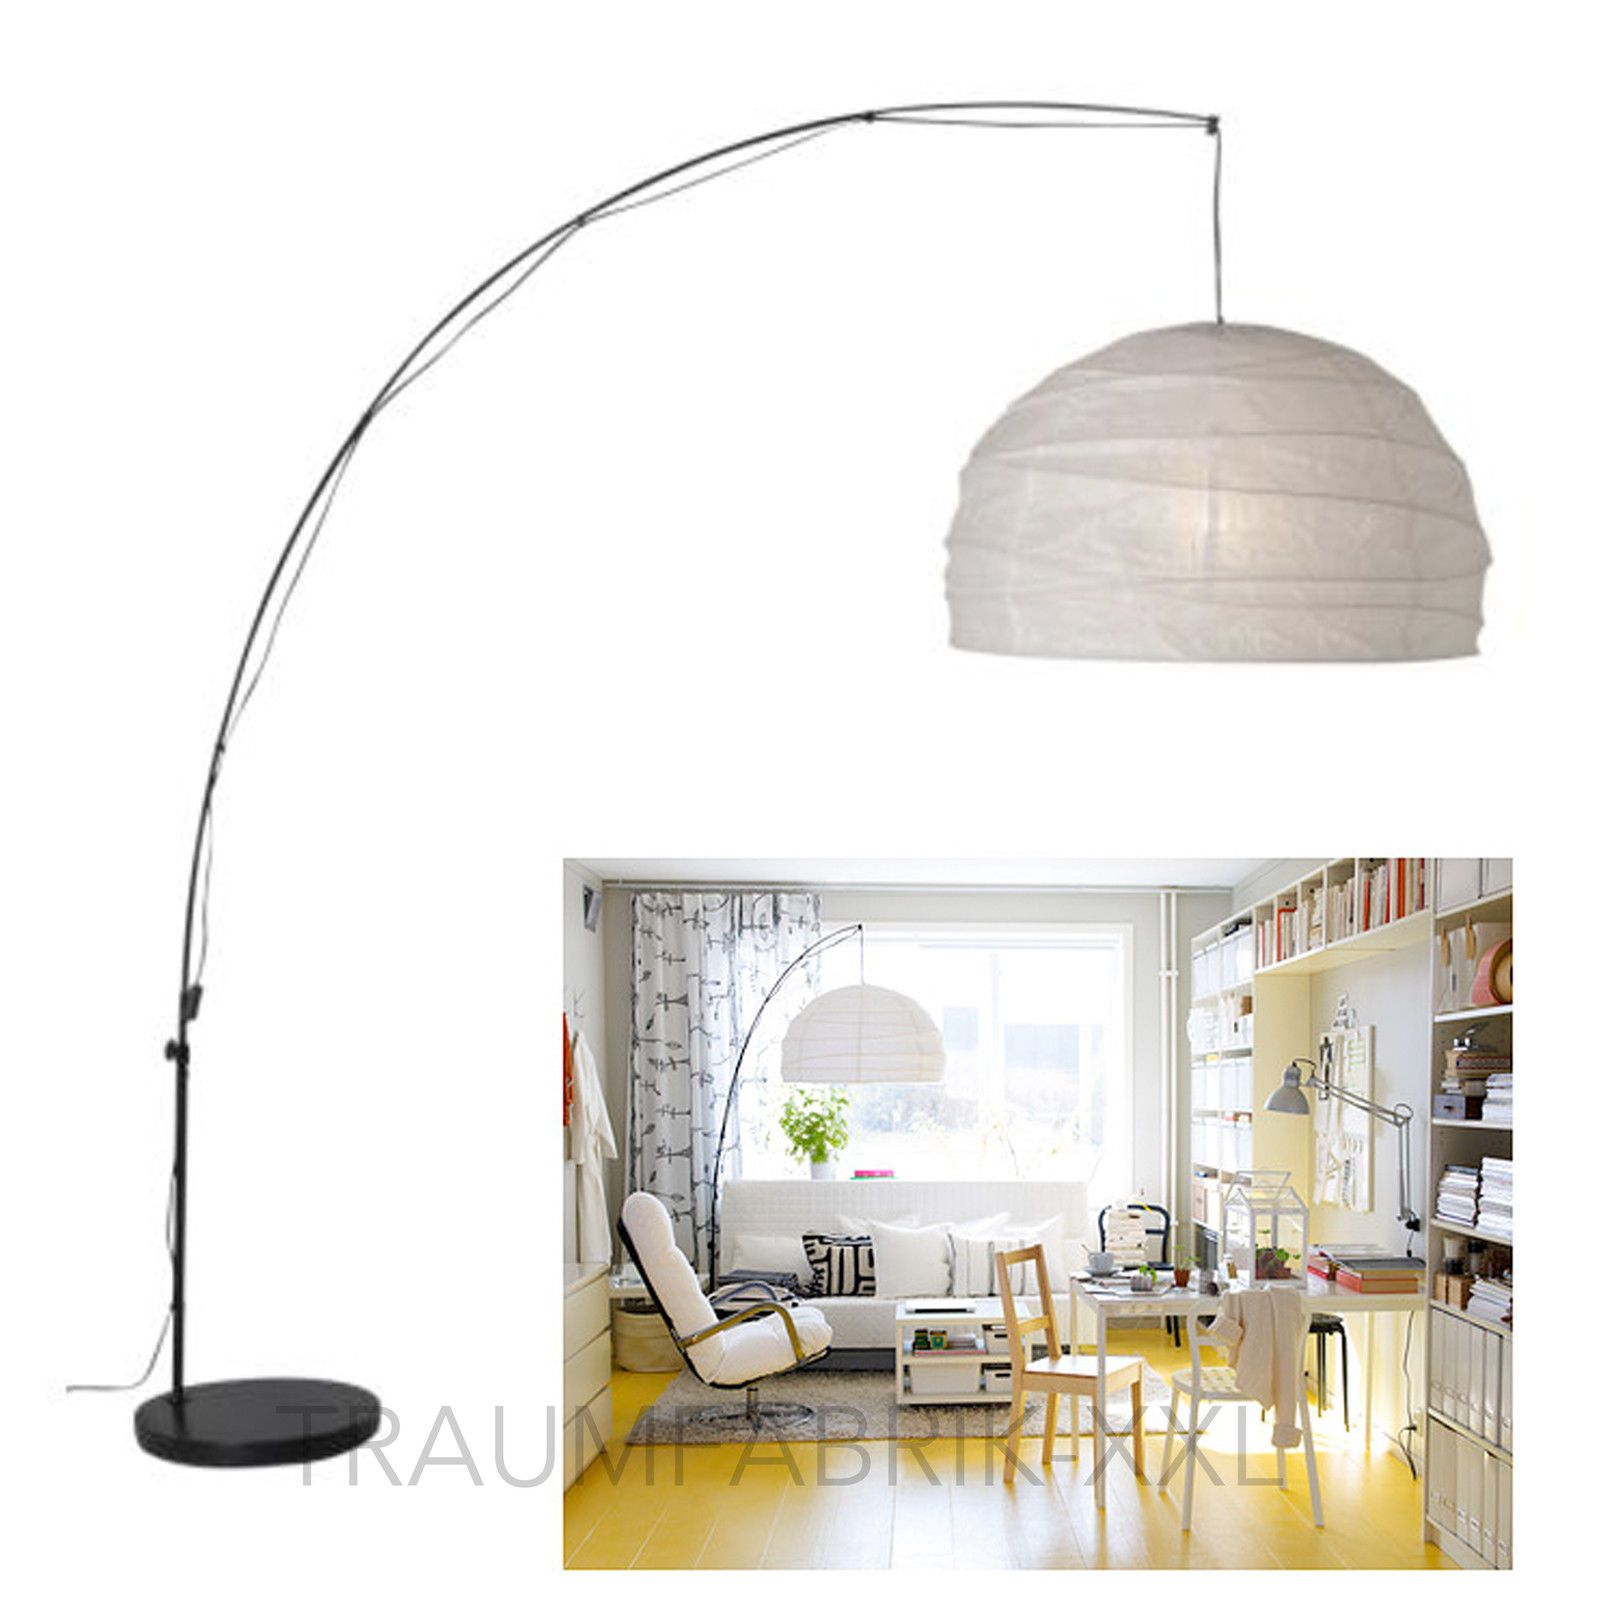 Full Size of Ikea Stehlampe Schirm Kaputt Papier Ersatzschirm Stehlampen Wohnzimmer Dimmen Deckenfluter Not Gold Regolit Xxl Lounge Lampe Küche Kosten Kaufen Betten Wohnzimmer Ikea Stehlampe